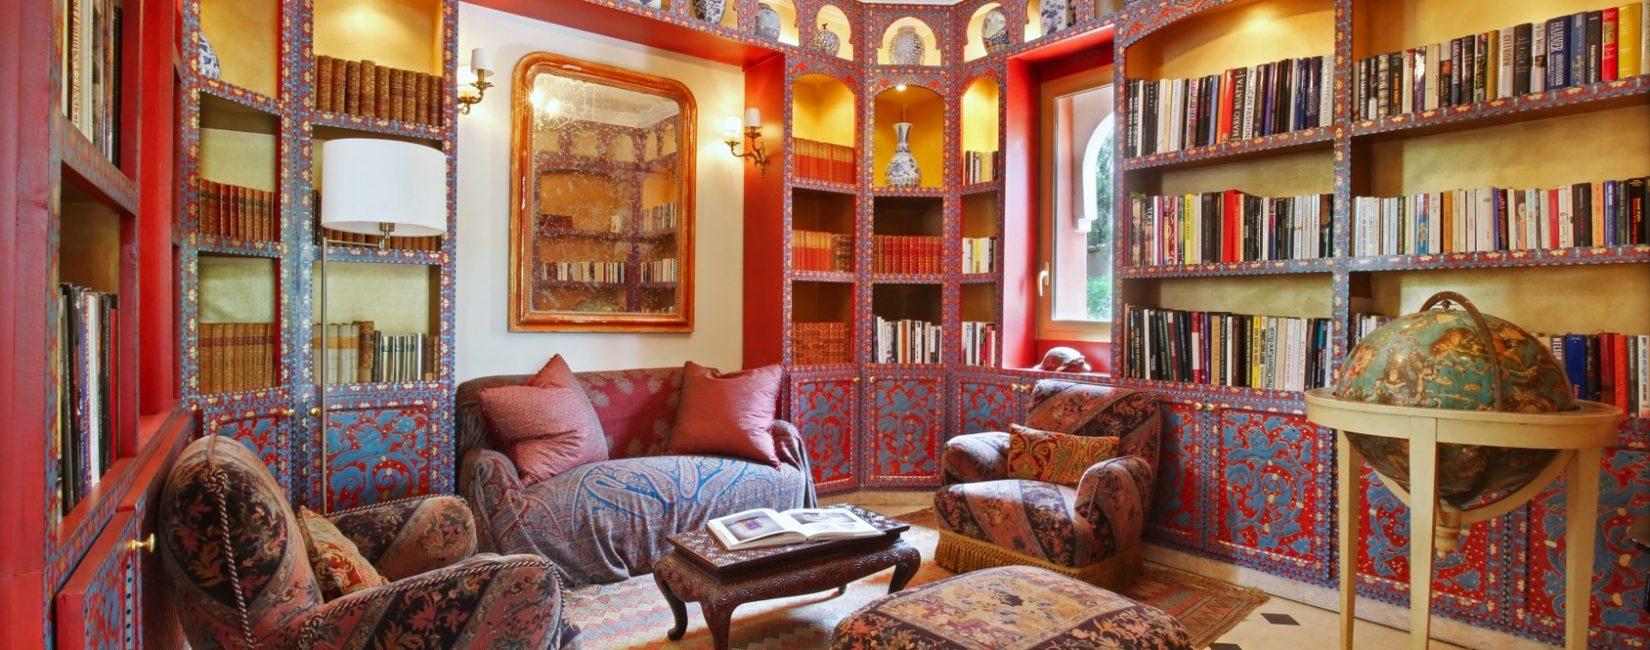 A unique hideaway in Marrakech